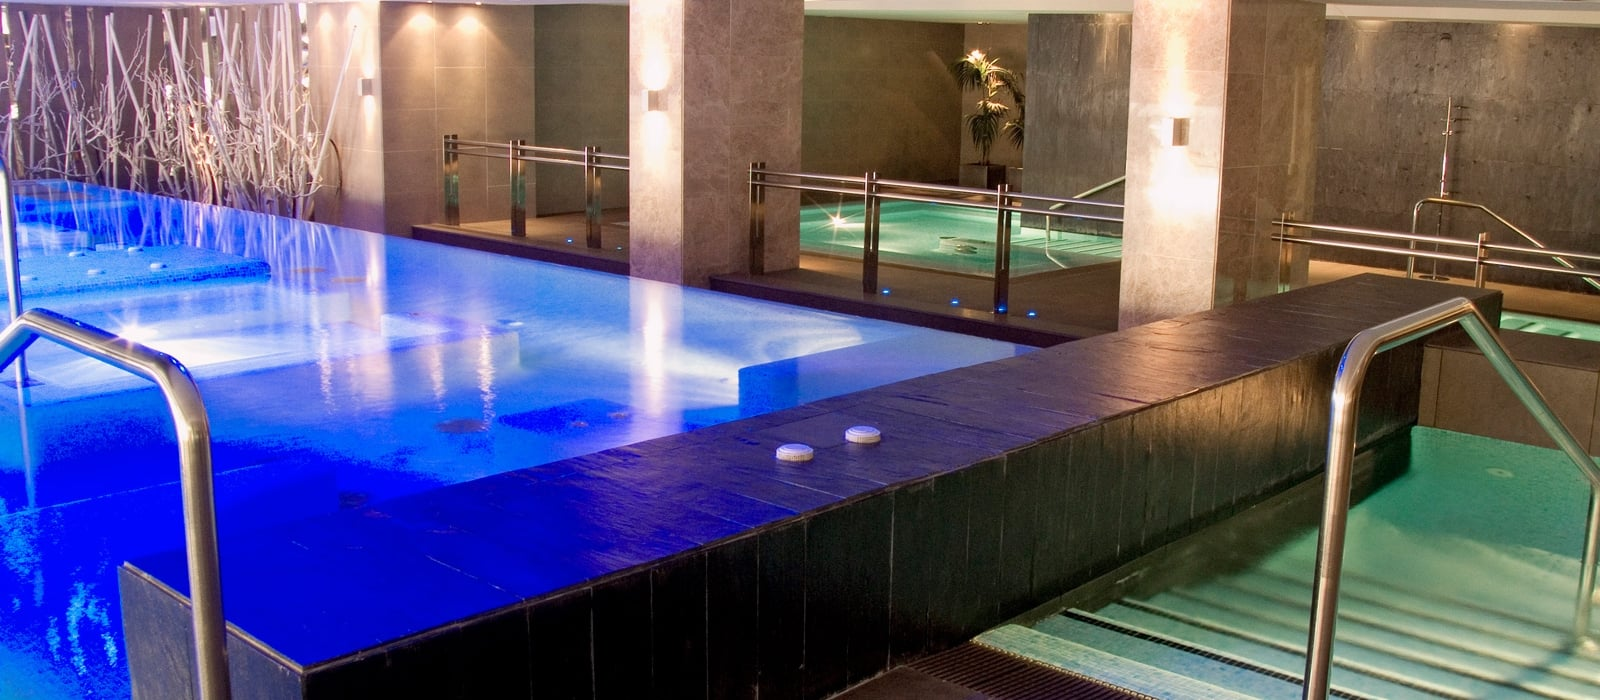 Spa Hotel Vincci Almería Wellness - Water circuit and baths